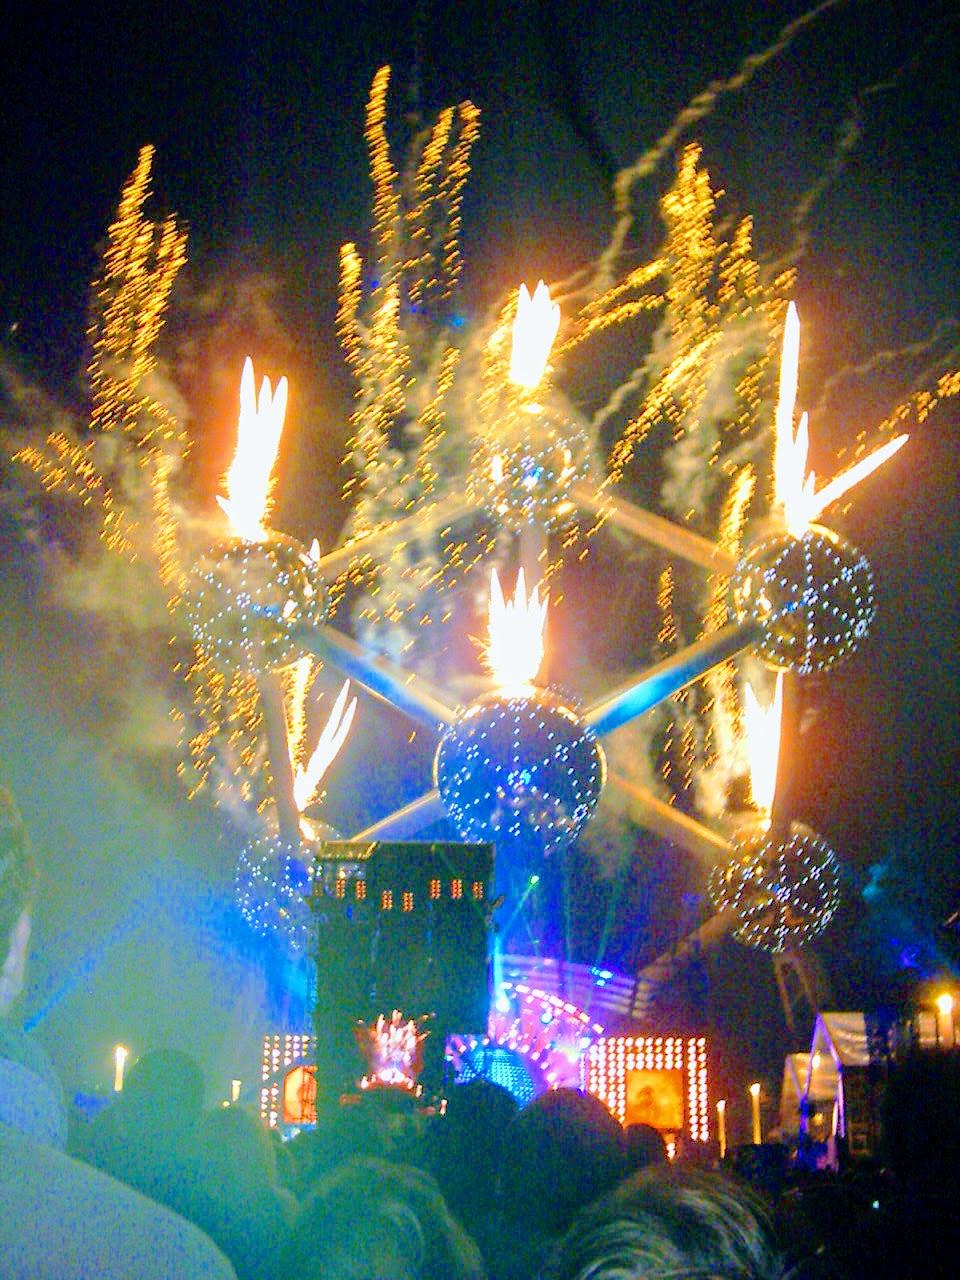 FireWorks Atomium - Brussels